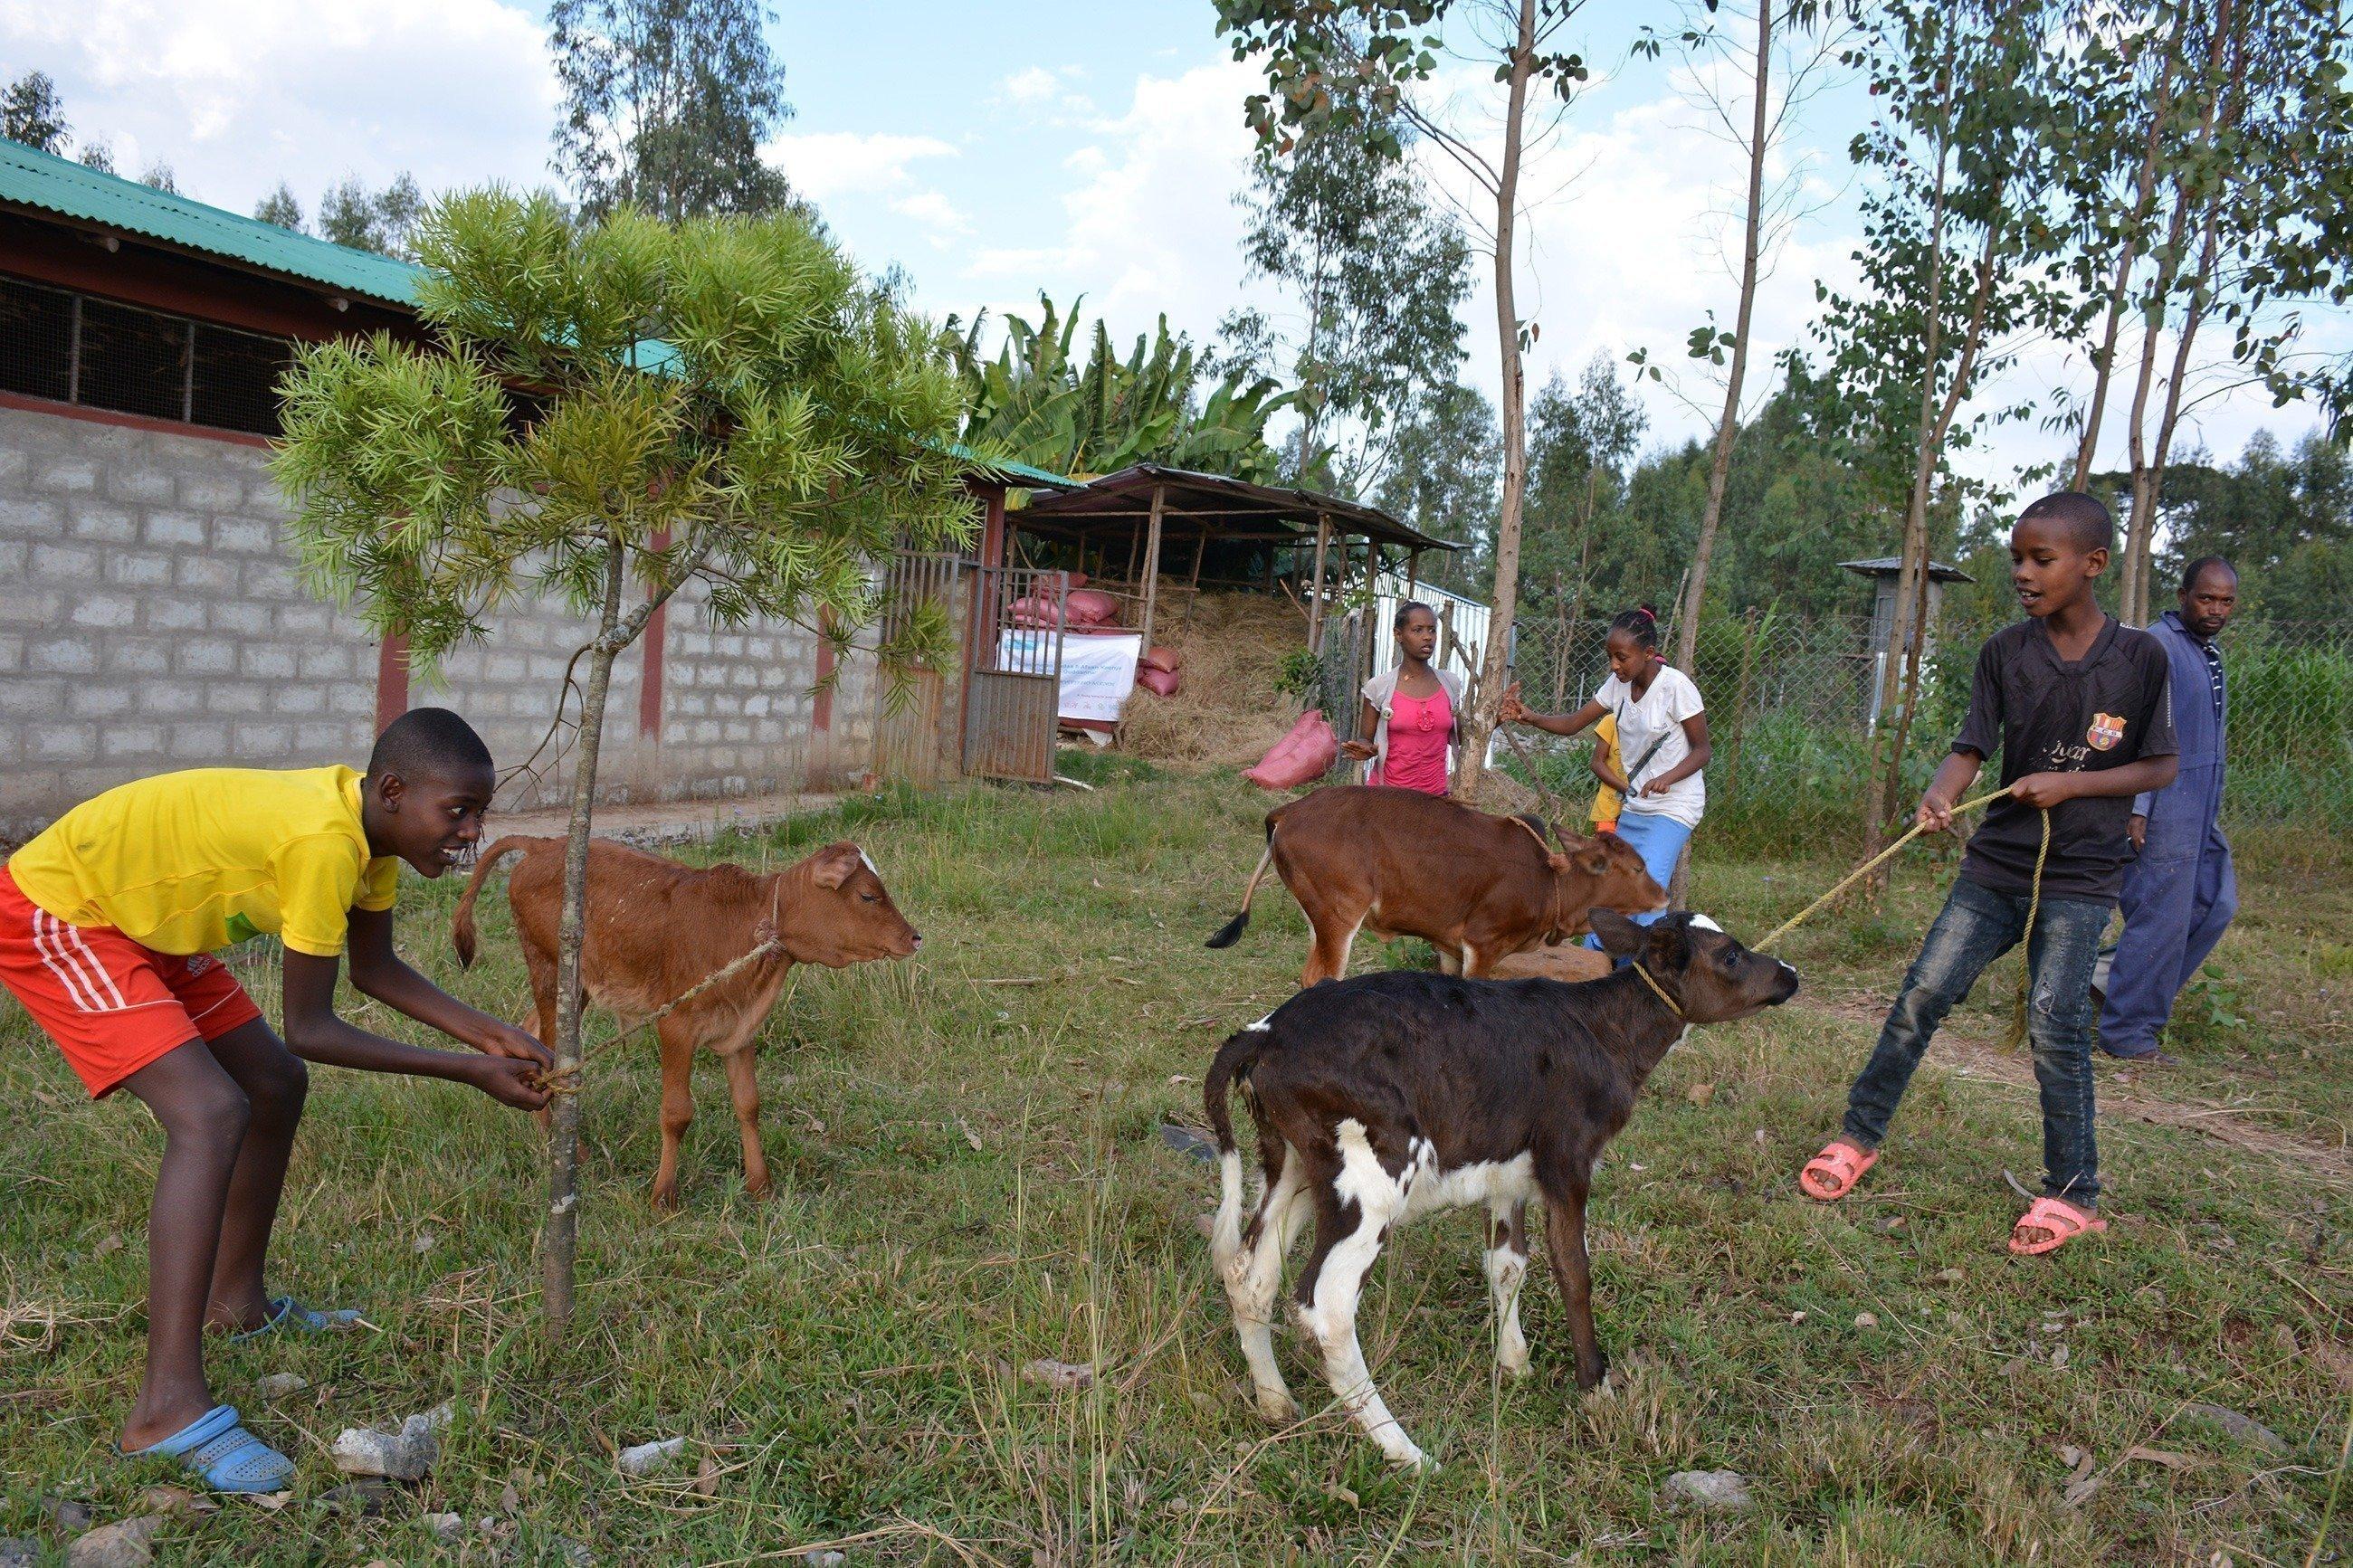 Plusieurs garçons s'occupent de leur jardin et de bœufs.